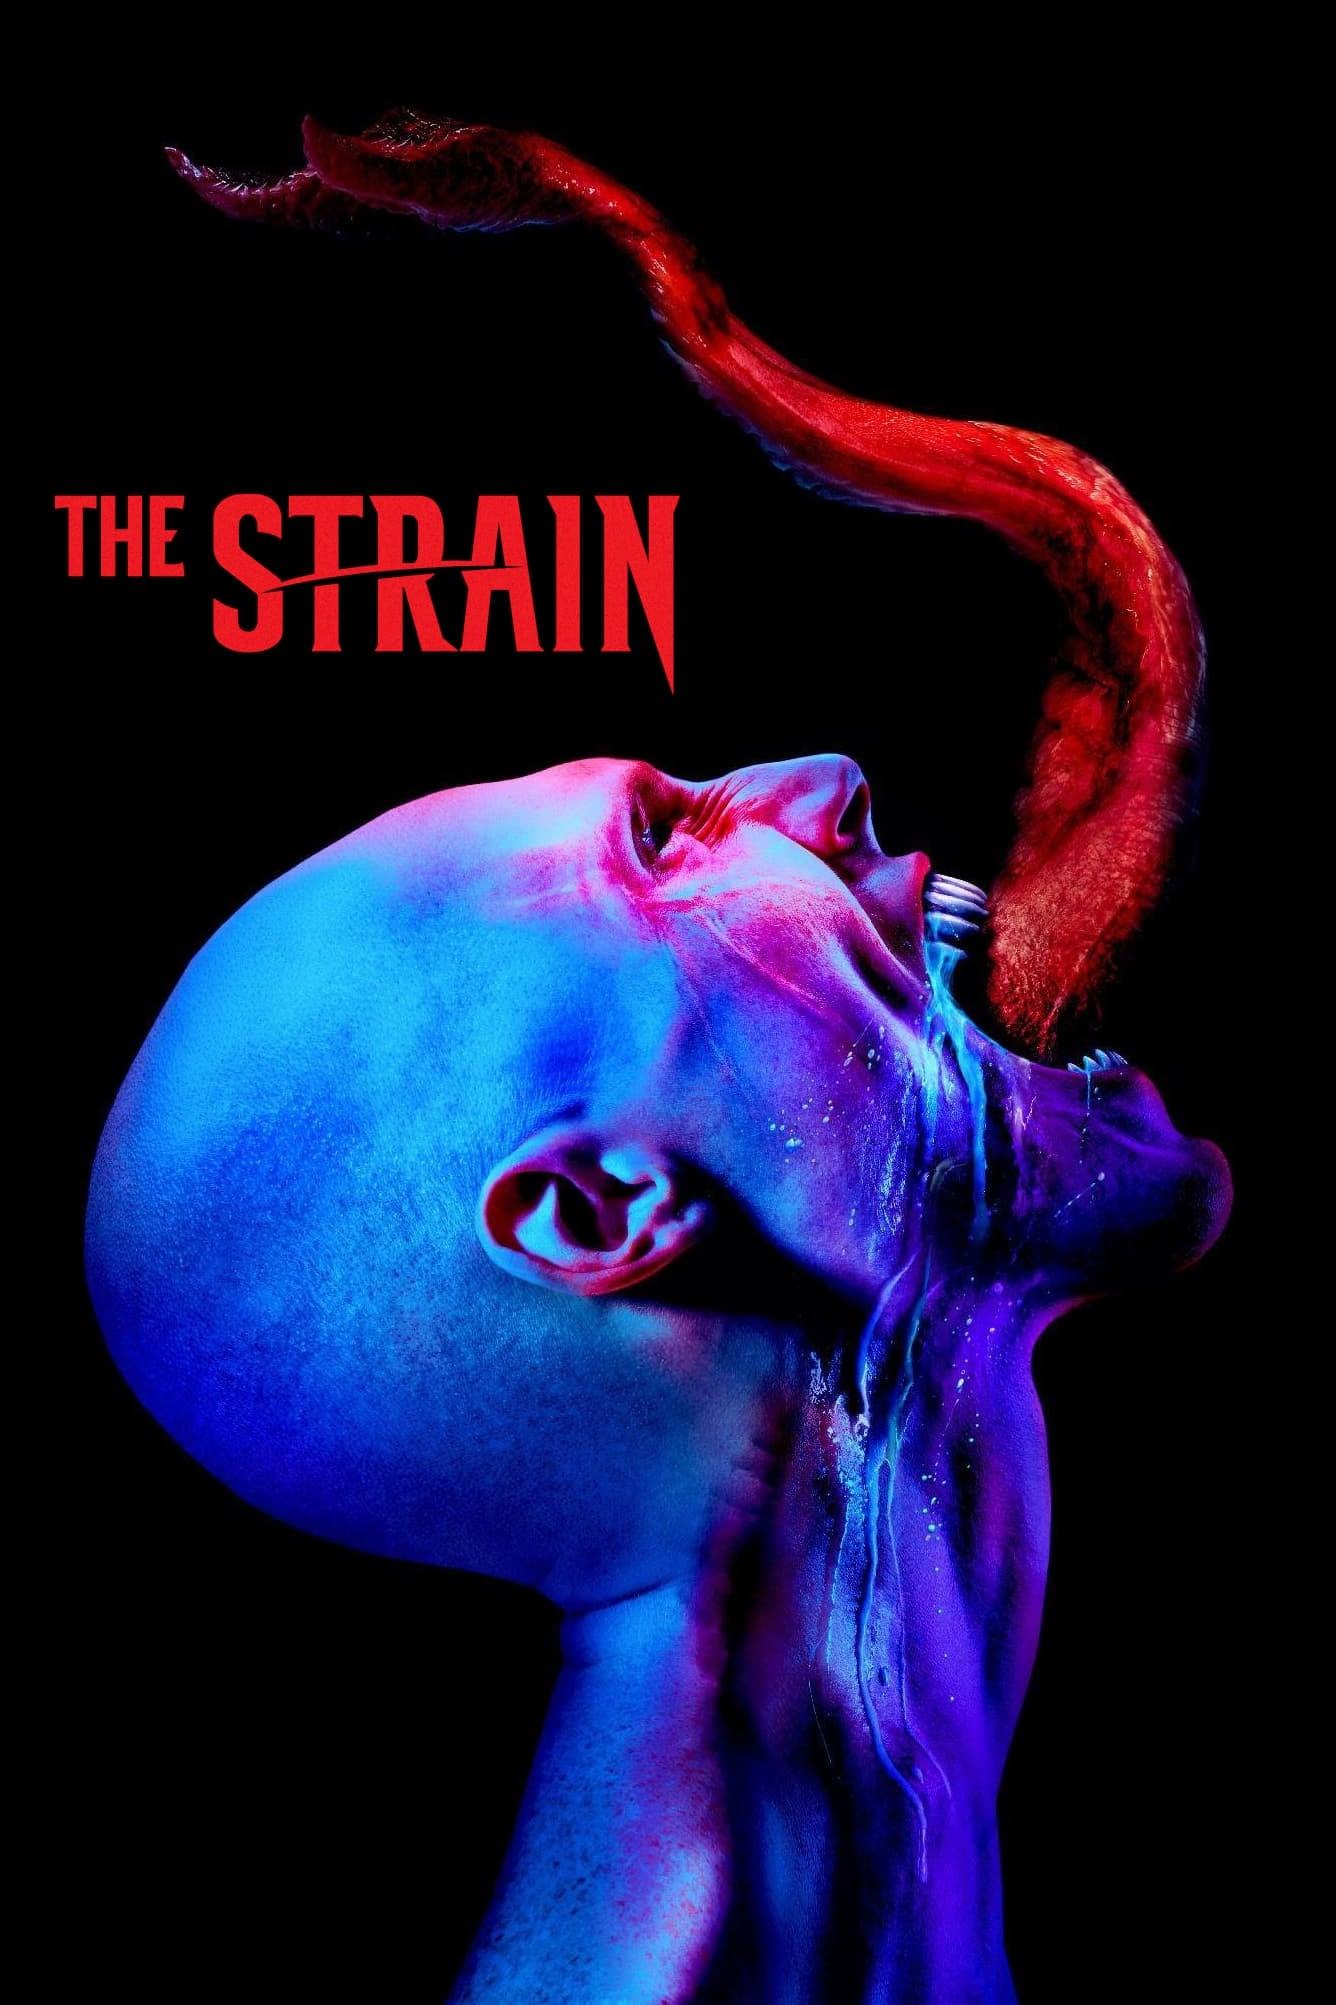 血族 第二季 The Strain Season 2 (2015) 中文字幕